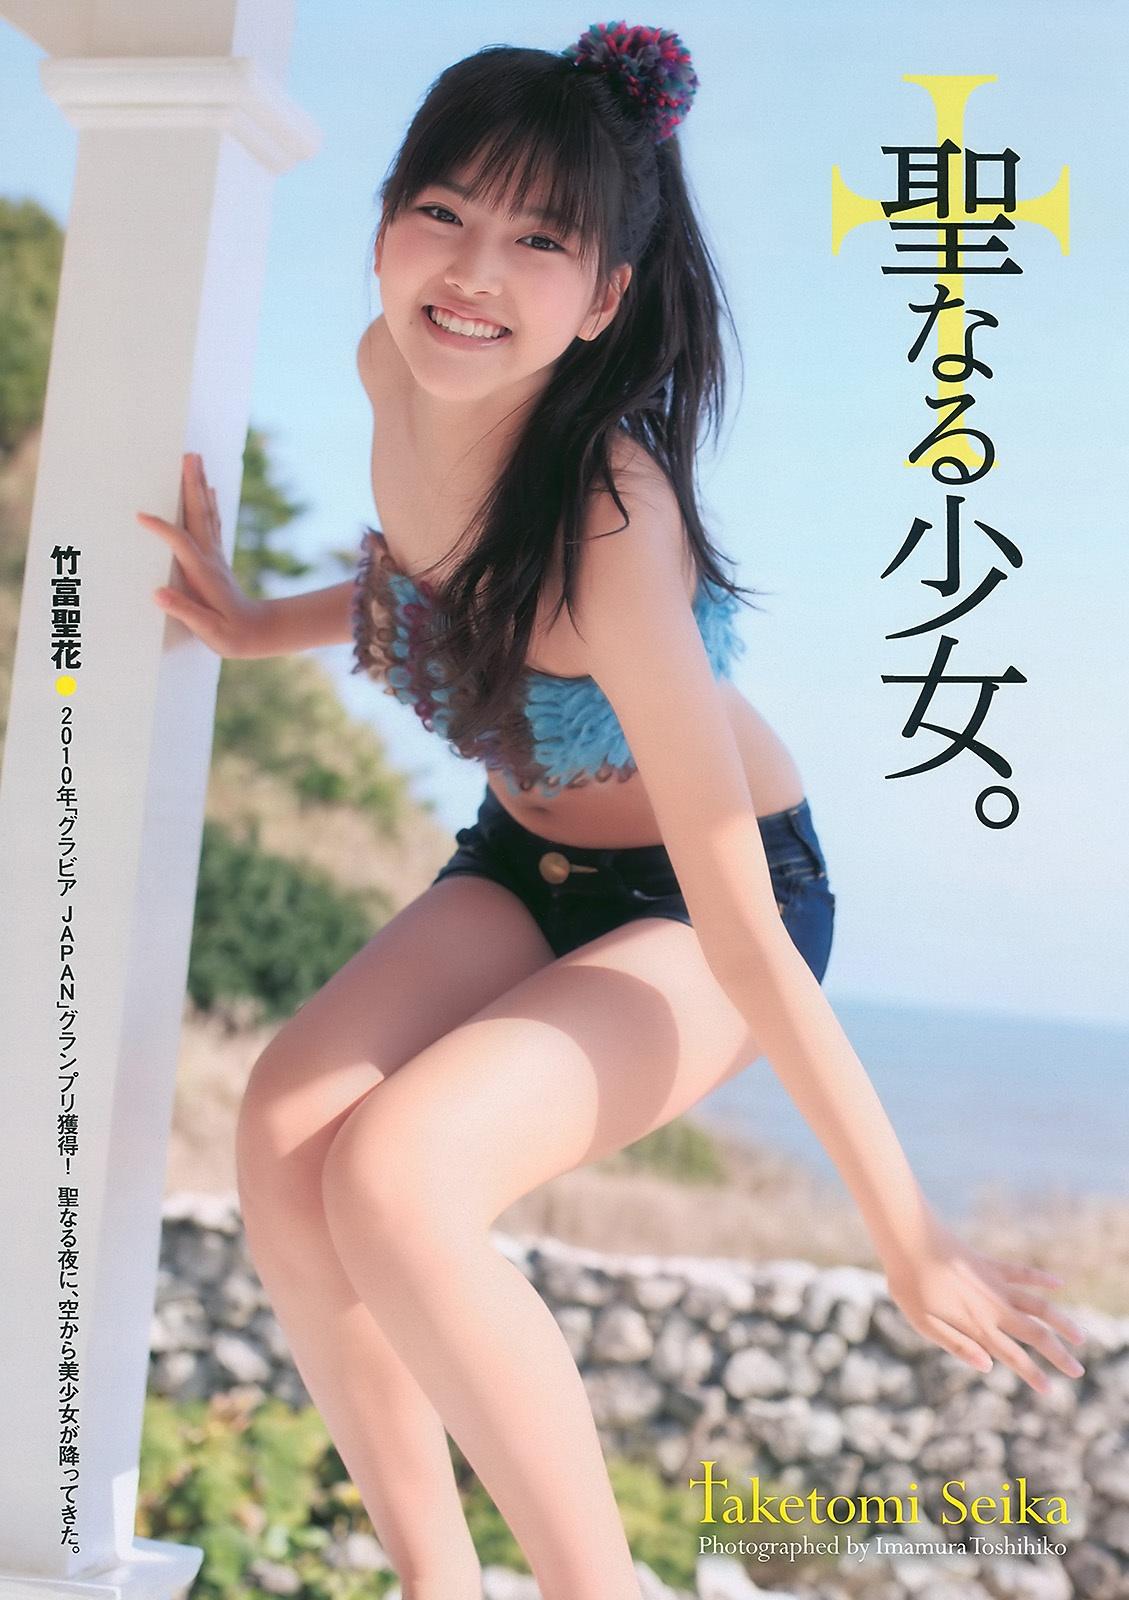 Taketomi Seika 竹富聖花